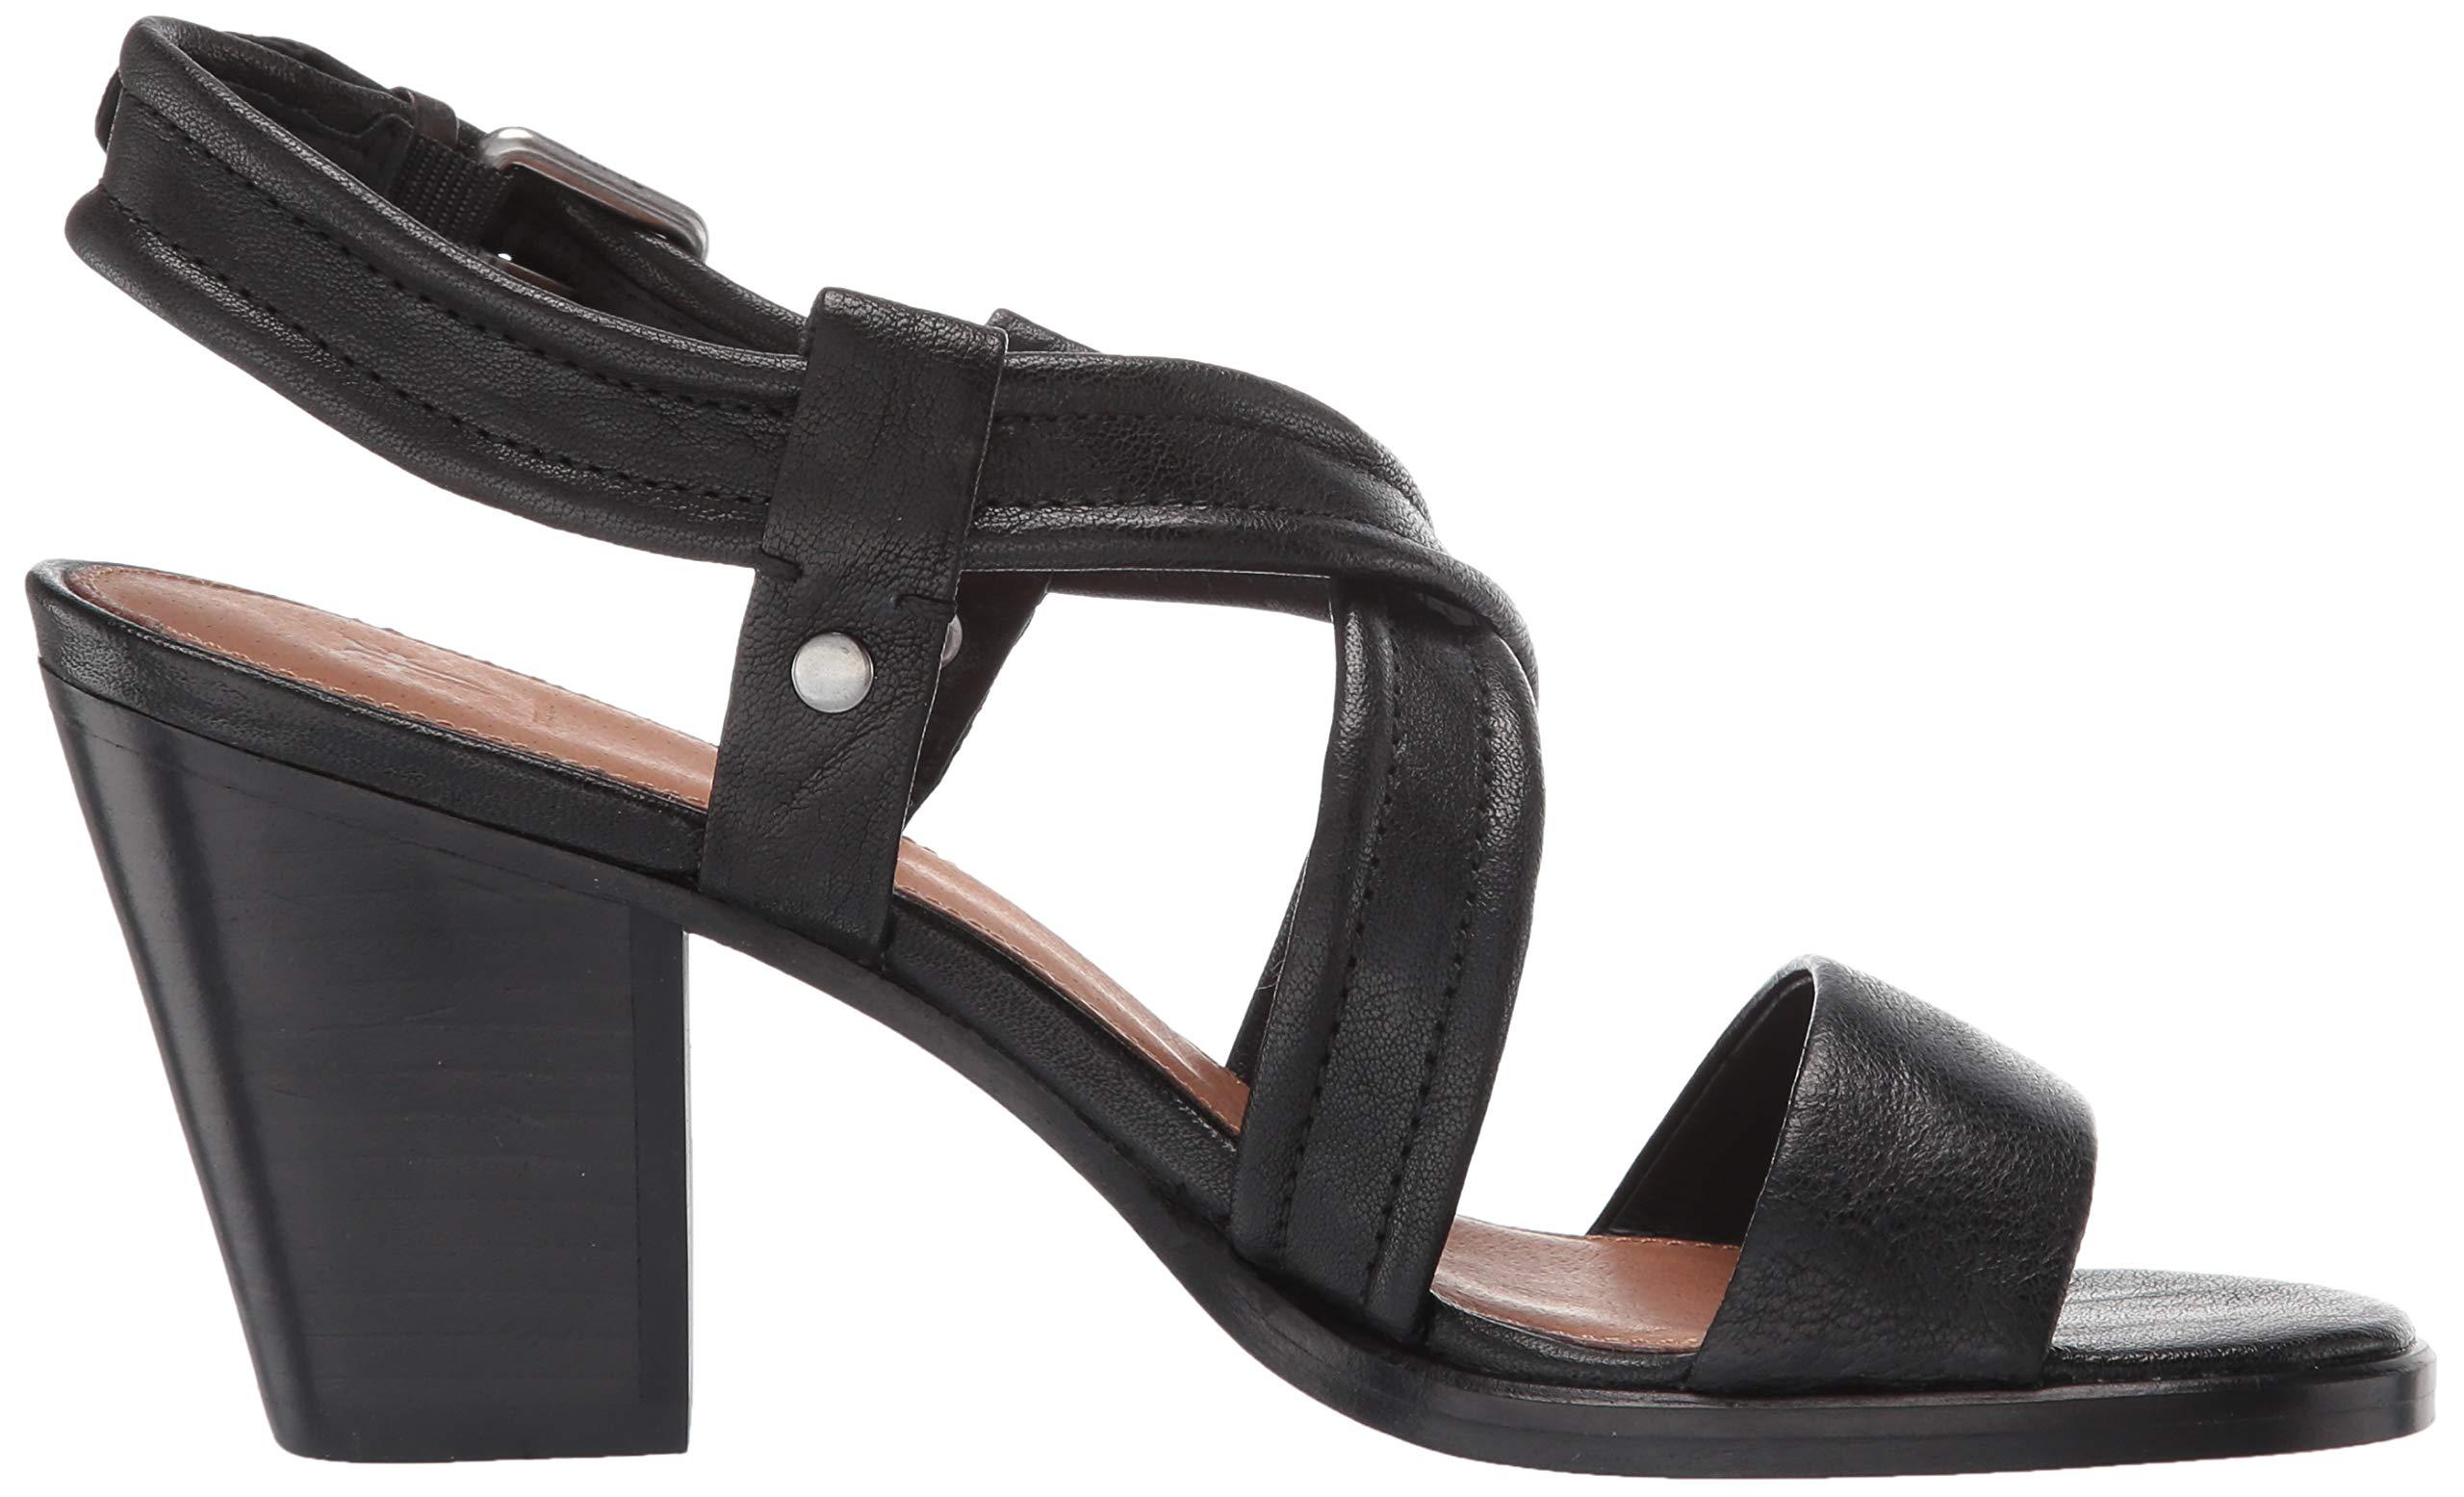 Frye Women S Dani Criss Cross Flat Sandal Black Choose